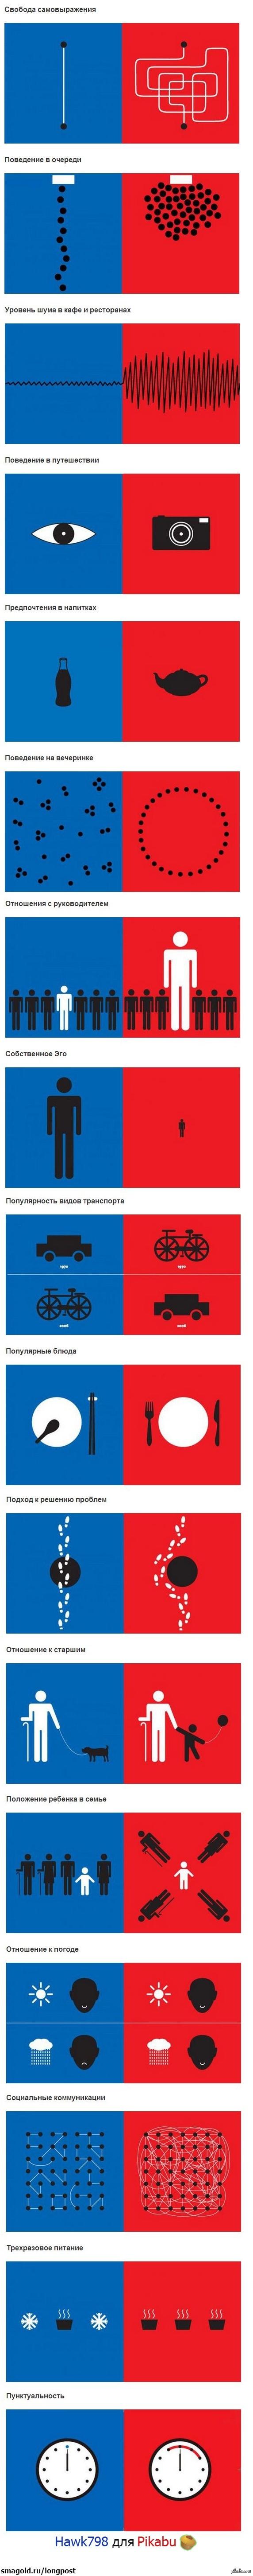 http://s.pikabu.ru/post_img/2013/10/08/6/1381215883_393753484.jpg